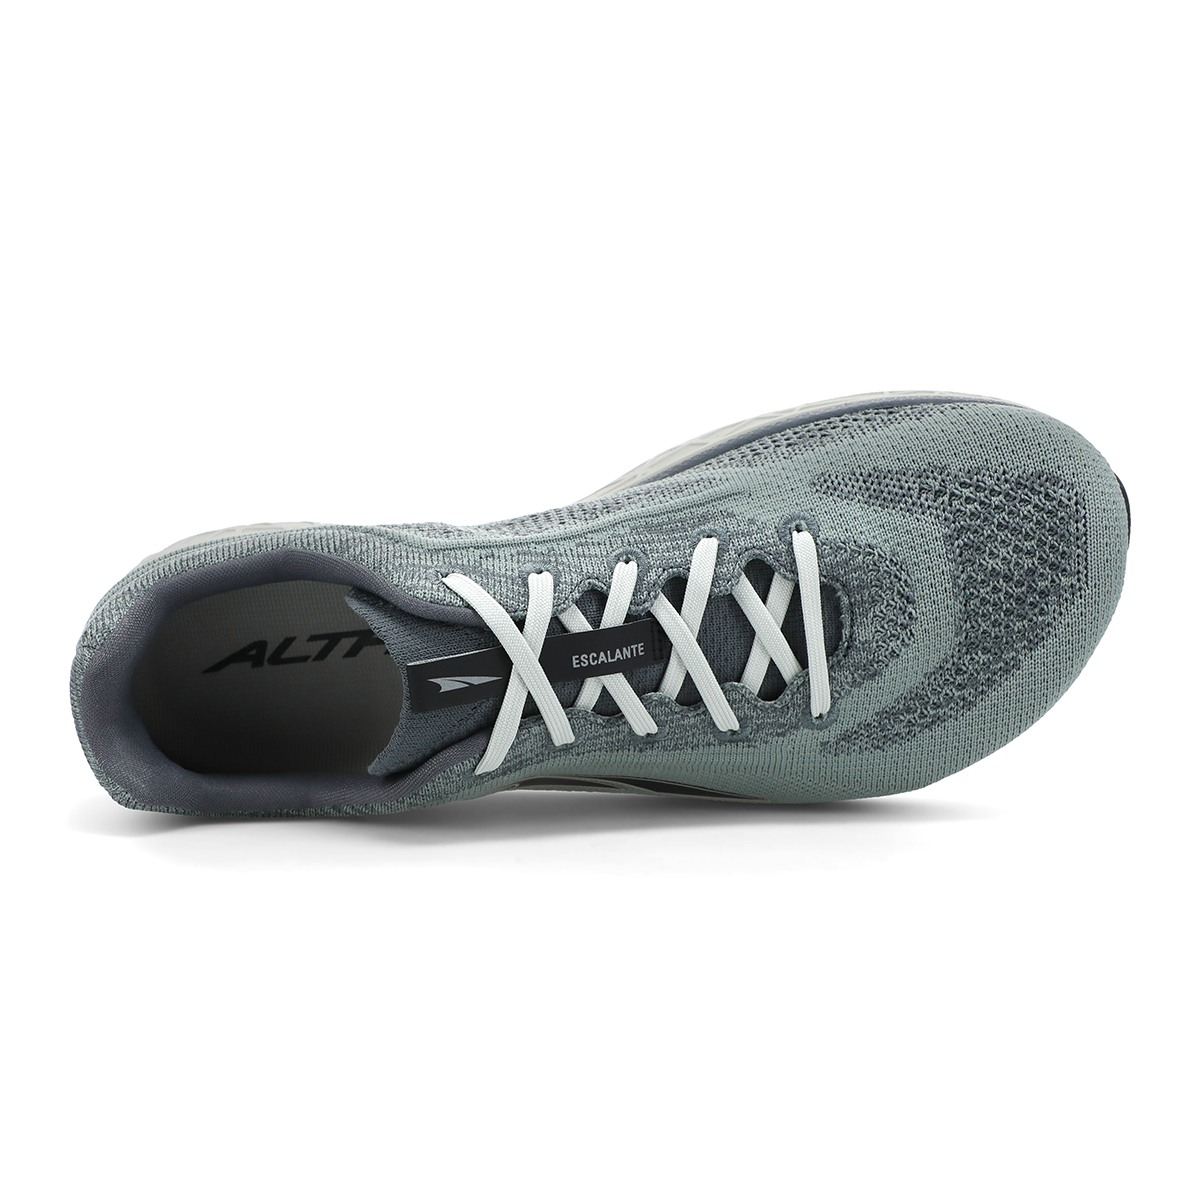 Men's Altra Escalante 2.5 Running Shoe - Color: Dark Slate - Size: 7 - Width: Regular, Dark Slate, large, image 3